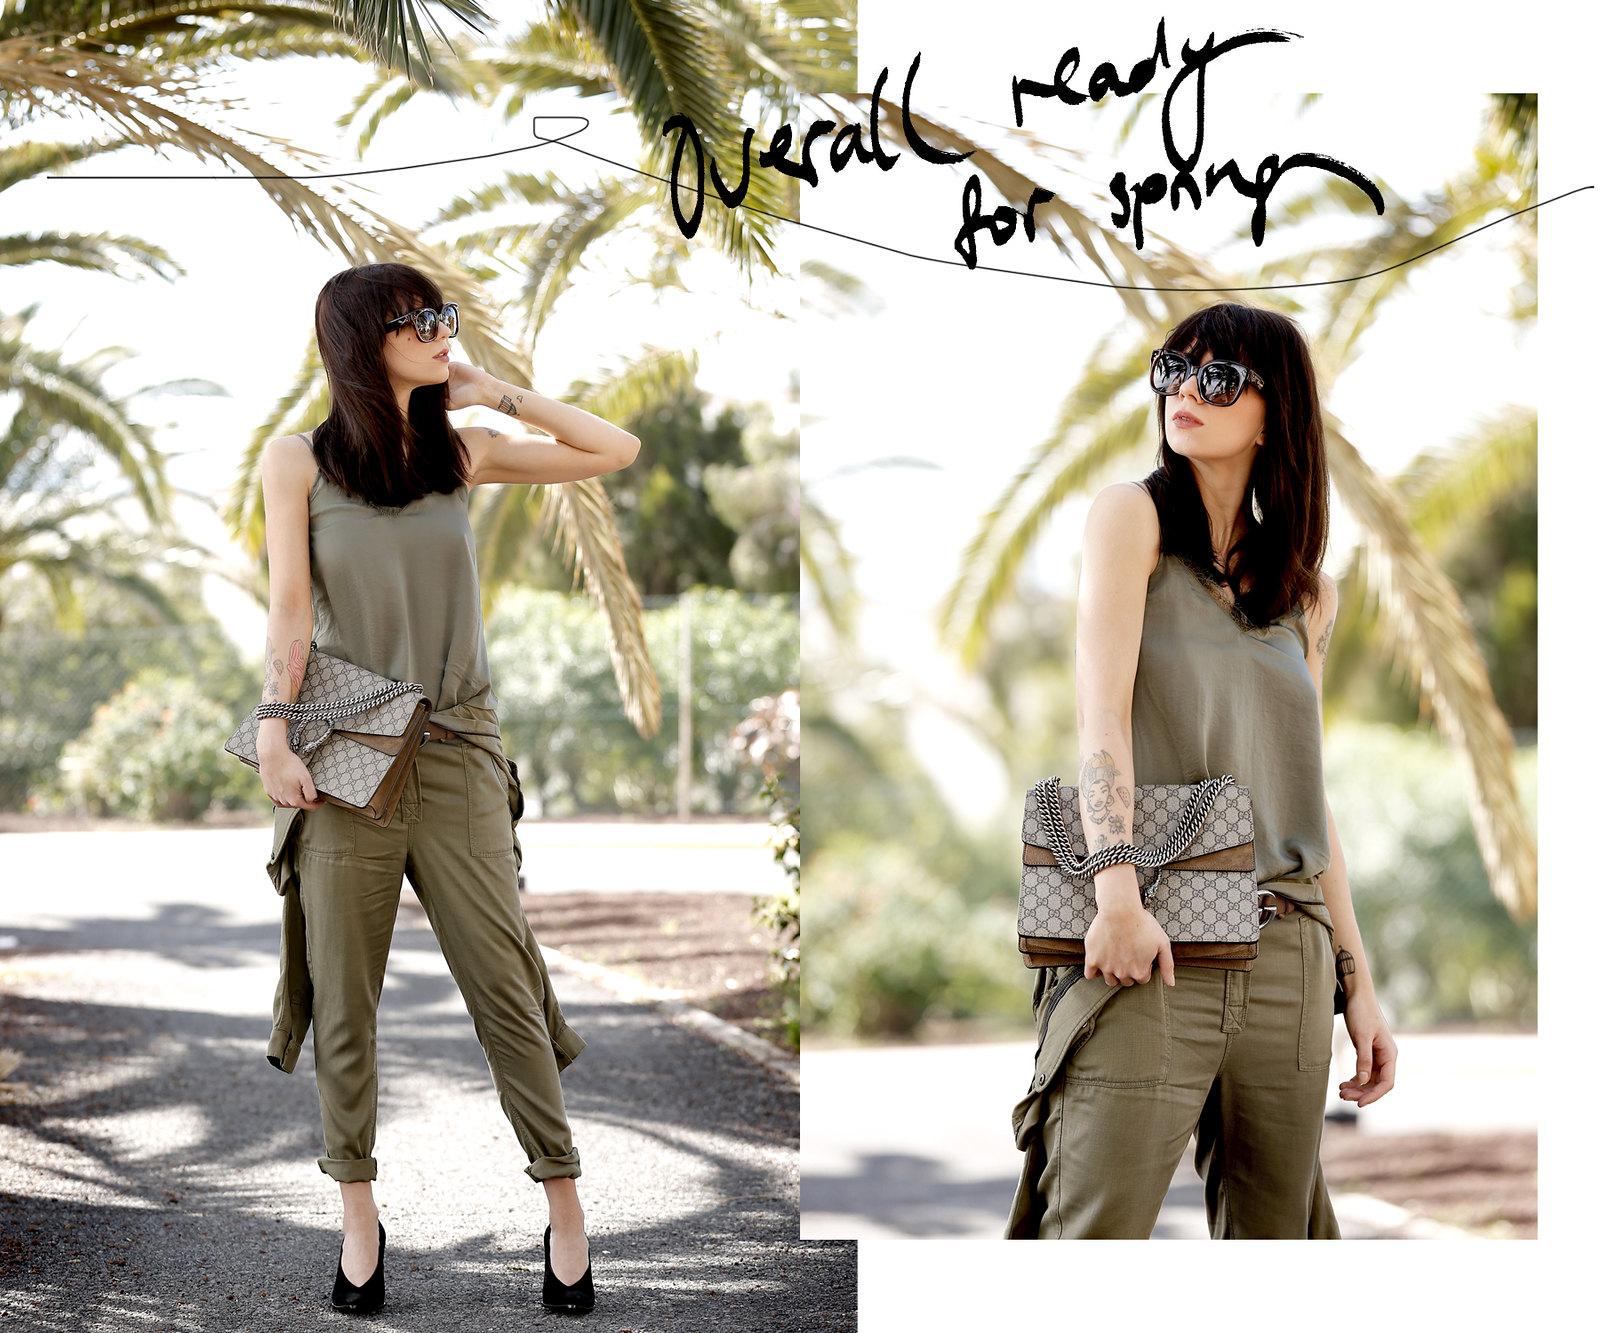 promod african safari jumpsuit khaki outfit ootd blogger modeblogger gucci dionysus céline audrey summer palms travelblogger cats & dogs ricarda schernus düsseldorf blog 6